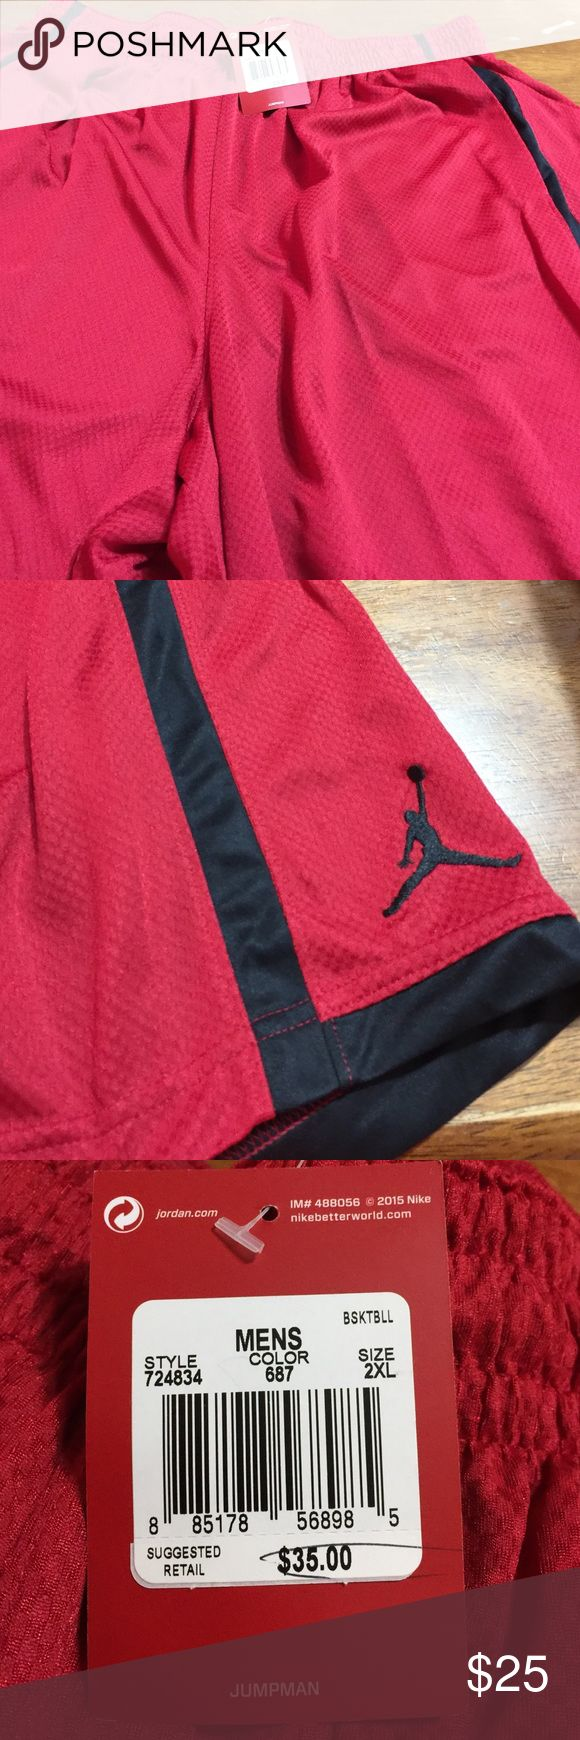 Nwt men's 2x red and black Jordan basketball short Nwt men's 2x Jordan basketball shorts. Red and black Jordan Shorts Athletic